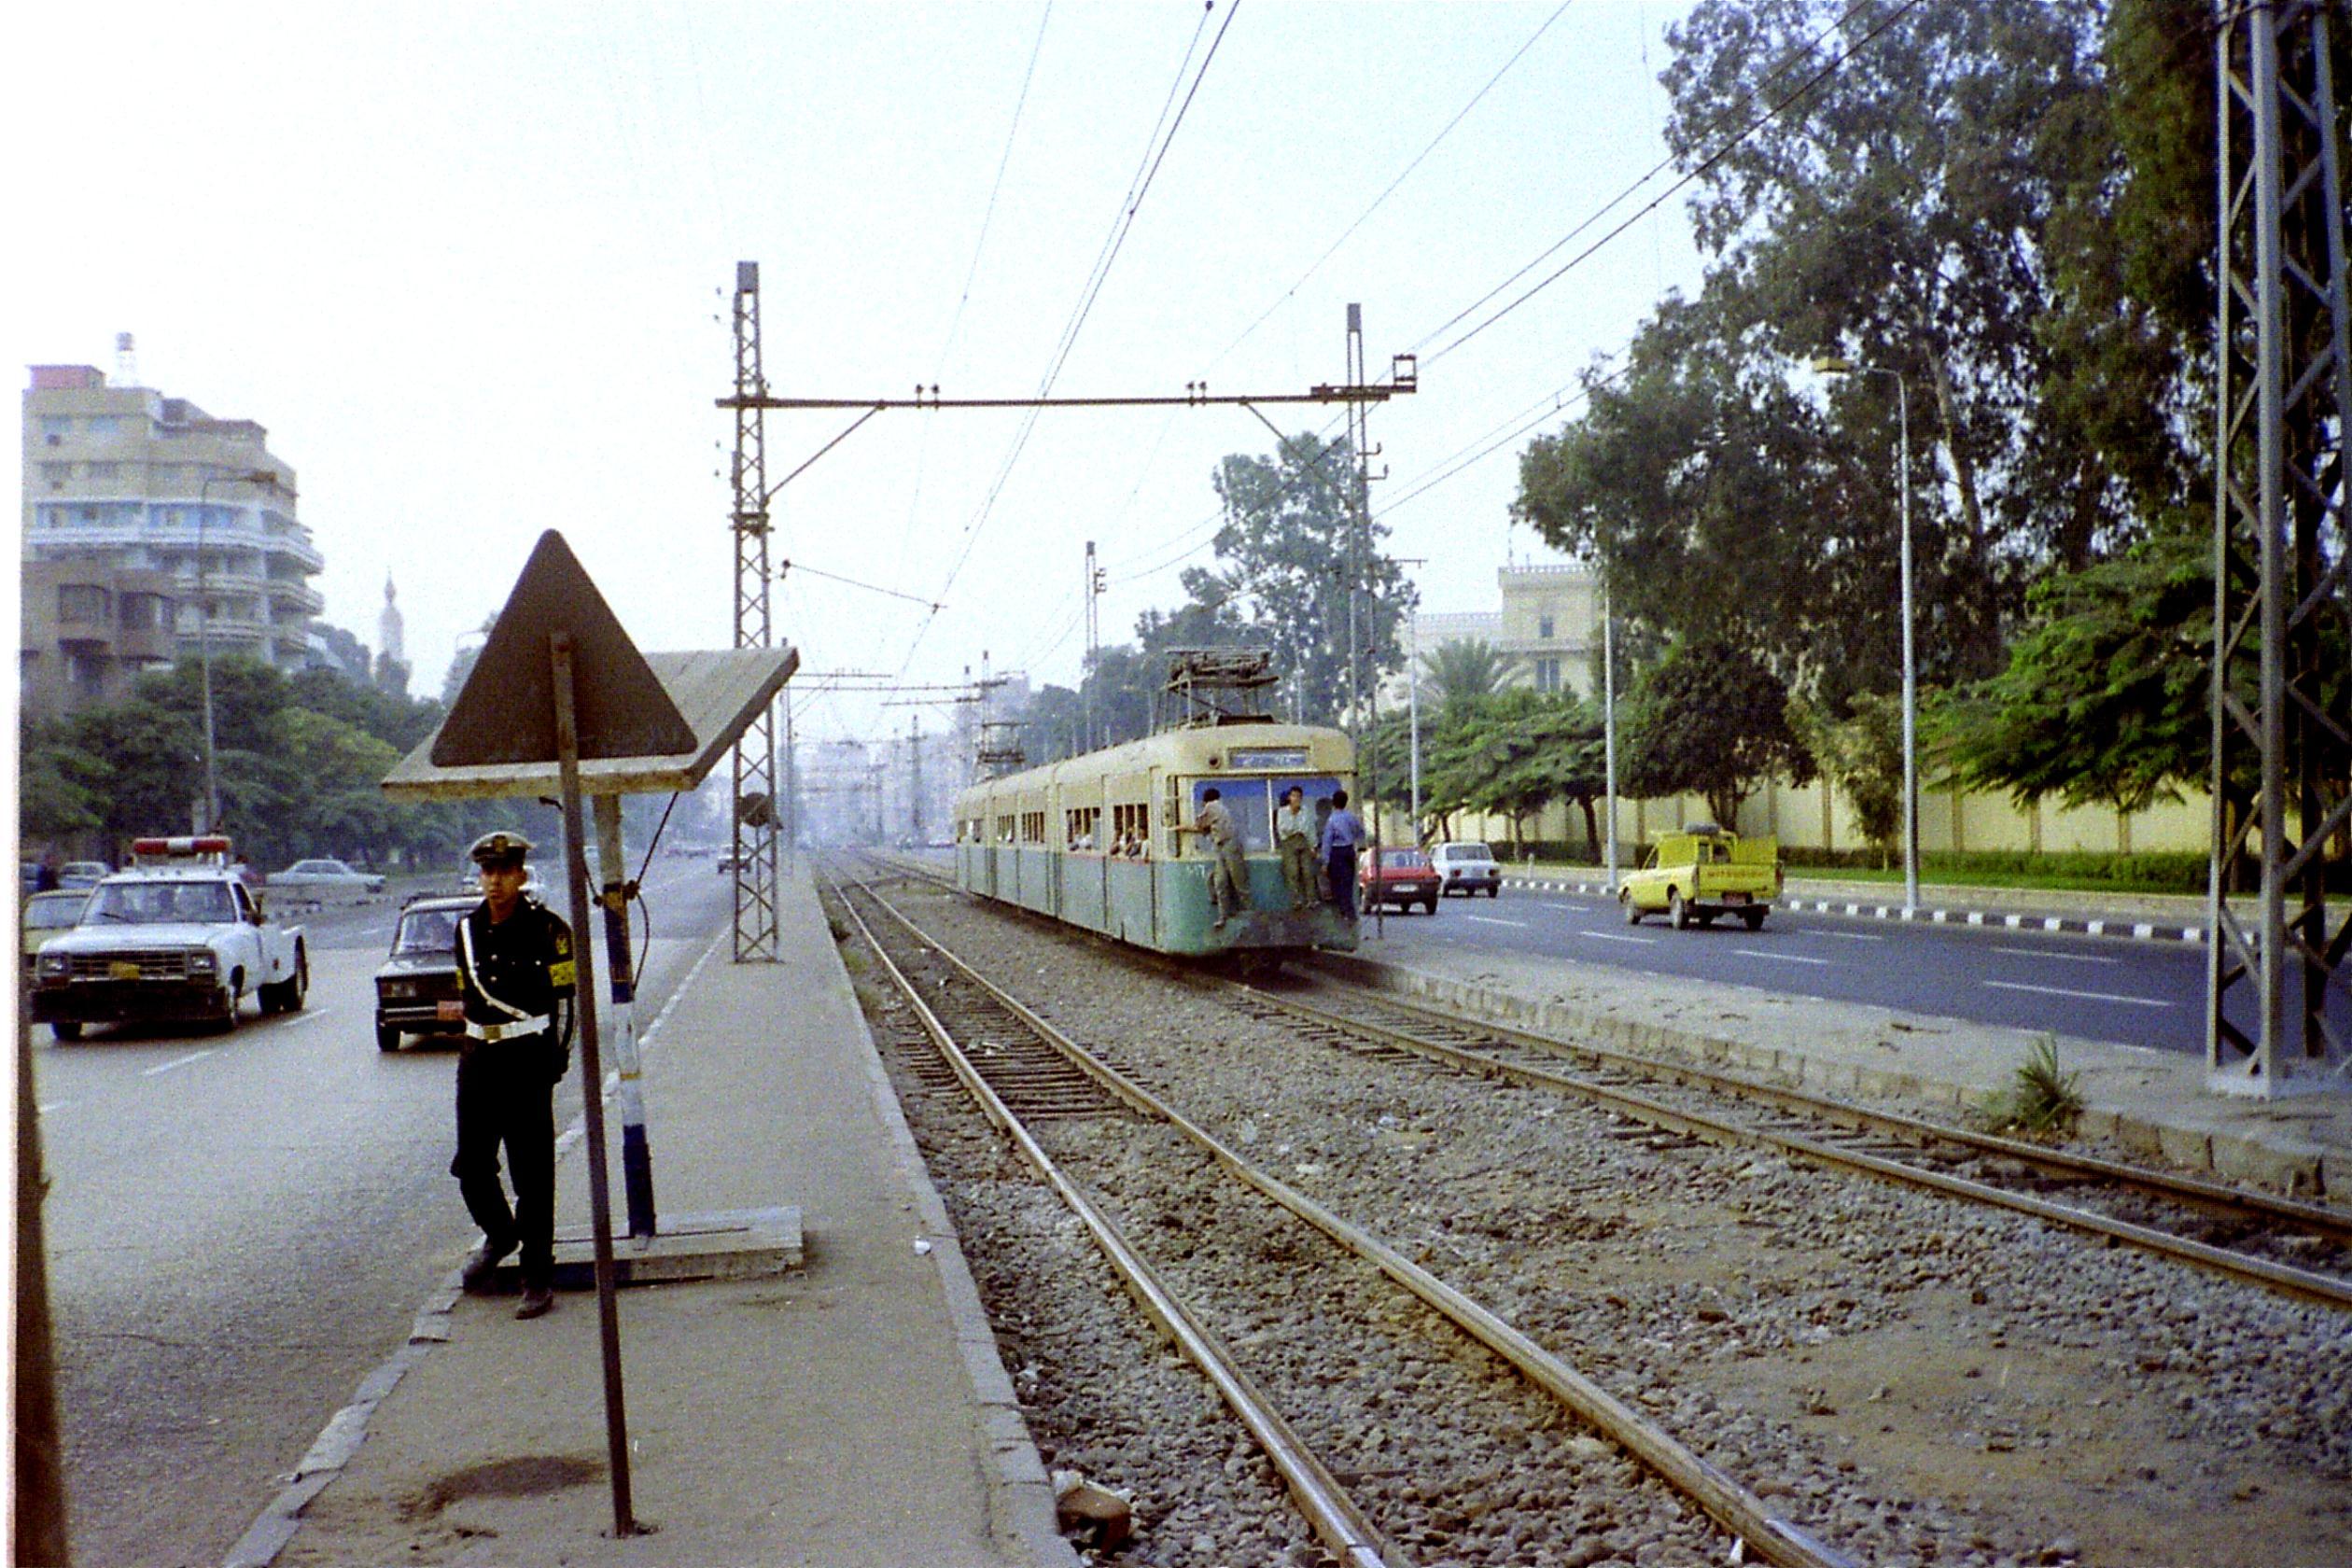 Cairo-Fare-Dodgers-Tram-We-Are-Railfans